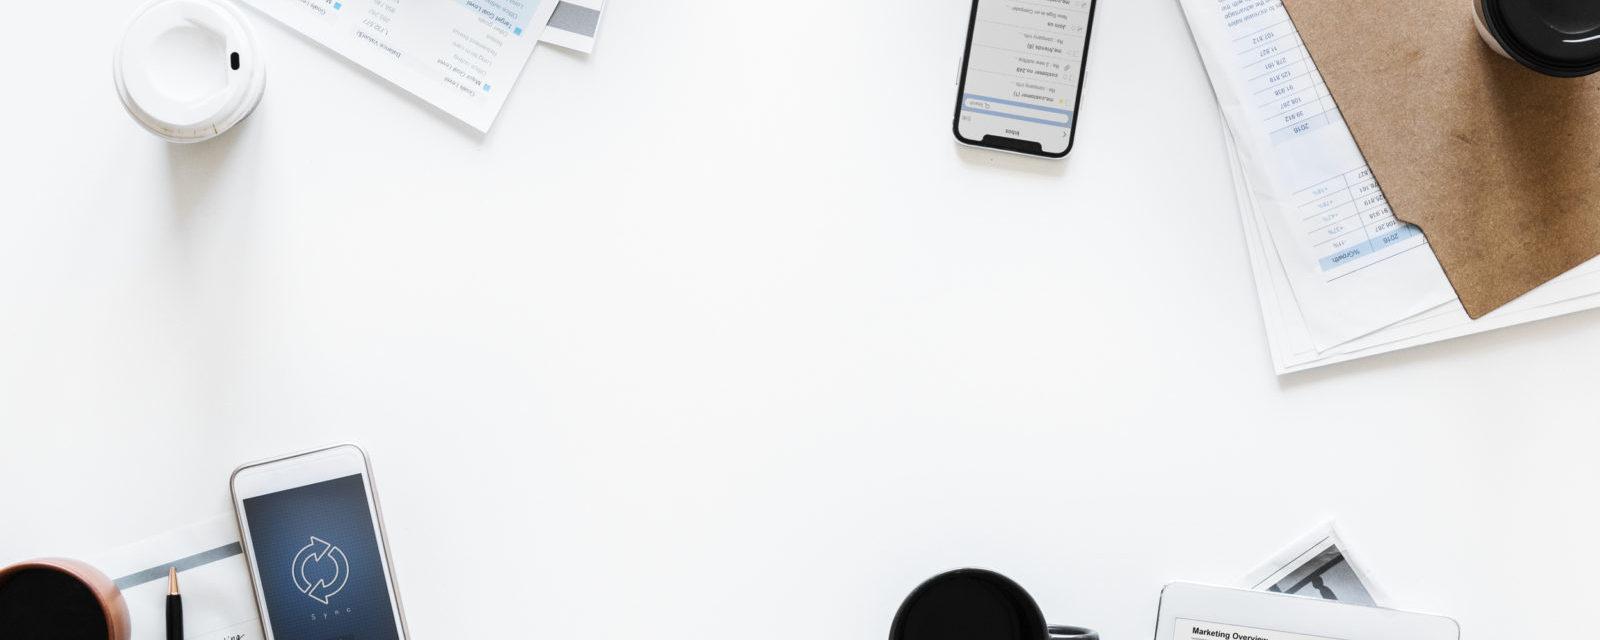 Neue Urheberrechtsabgabe lässt Preise bei Apple steigen